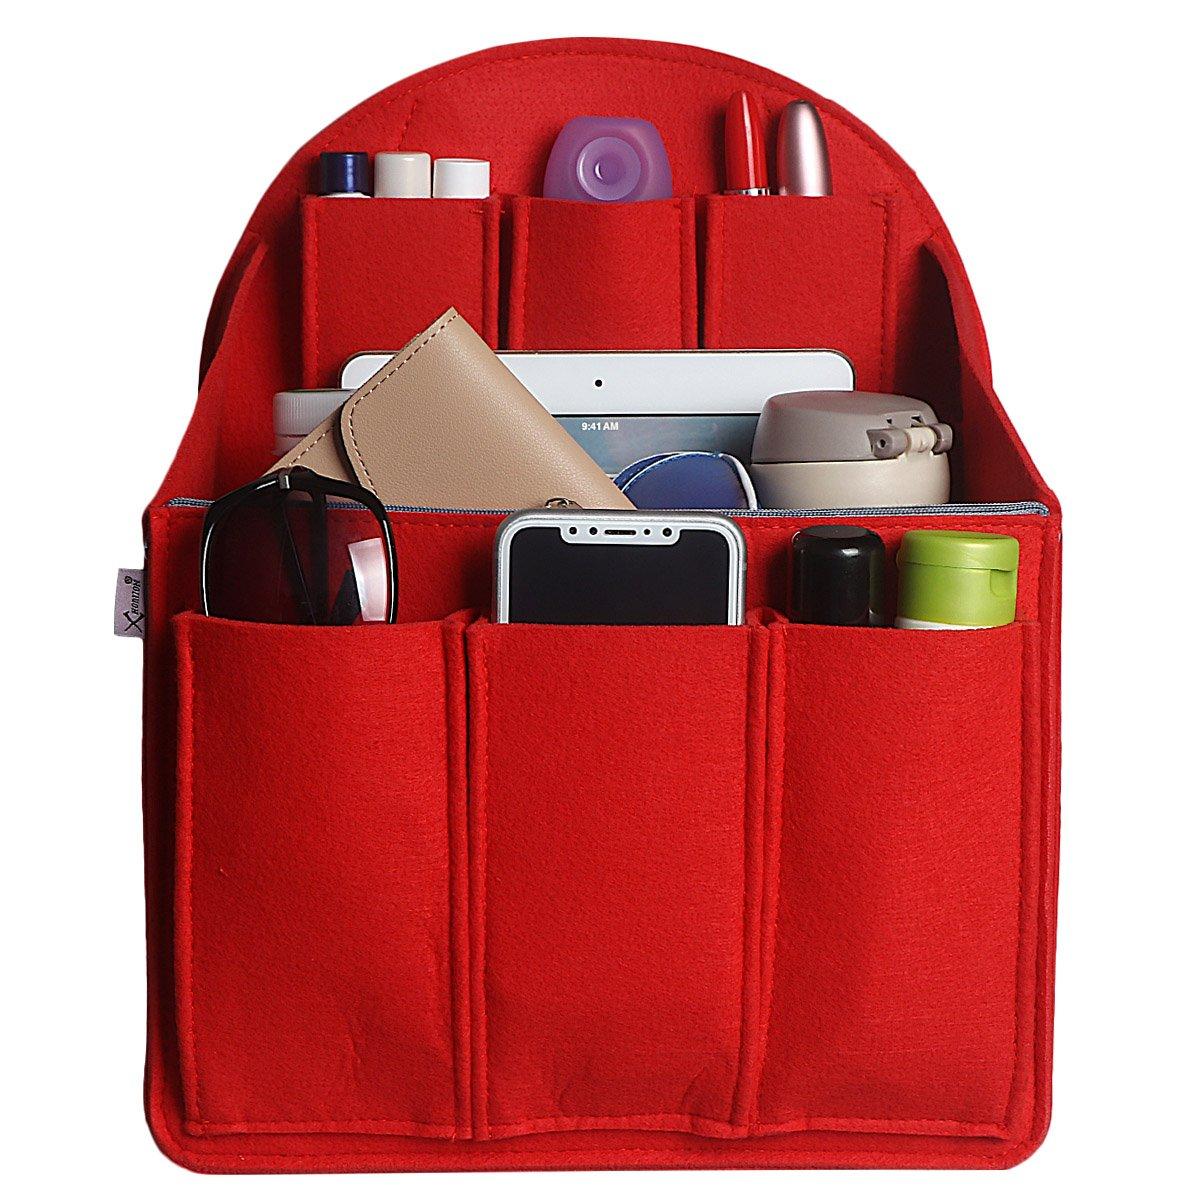 xhorizon SR Purse Organizer Insert Purse Handbag Tote Bag,Bag in Bag Organizer by xhorizon (Image #2)